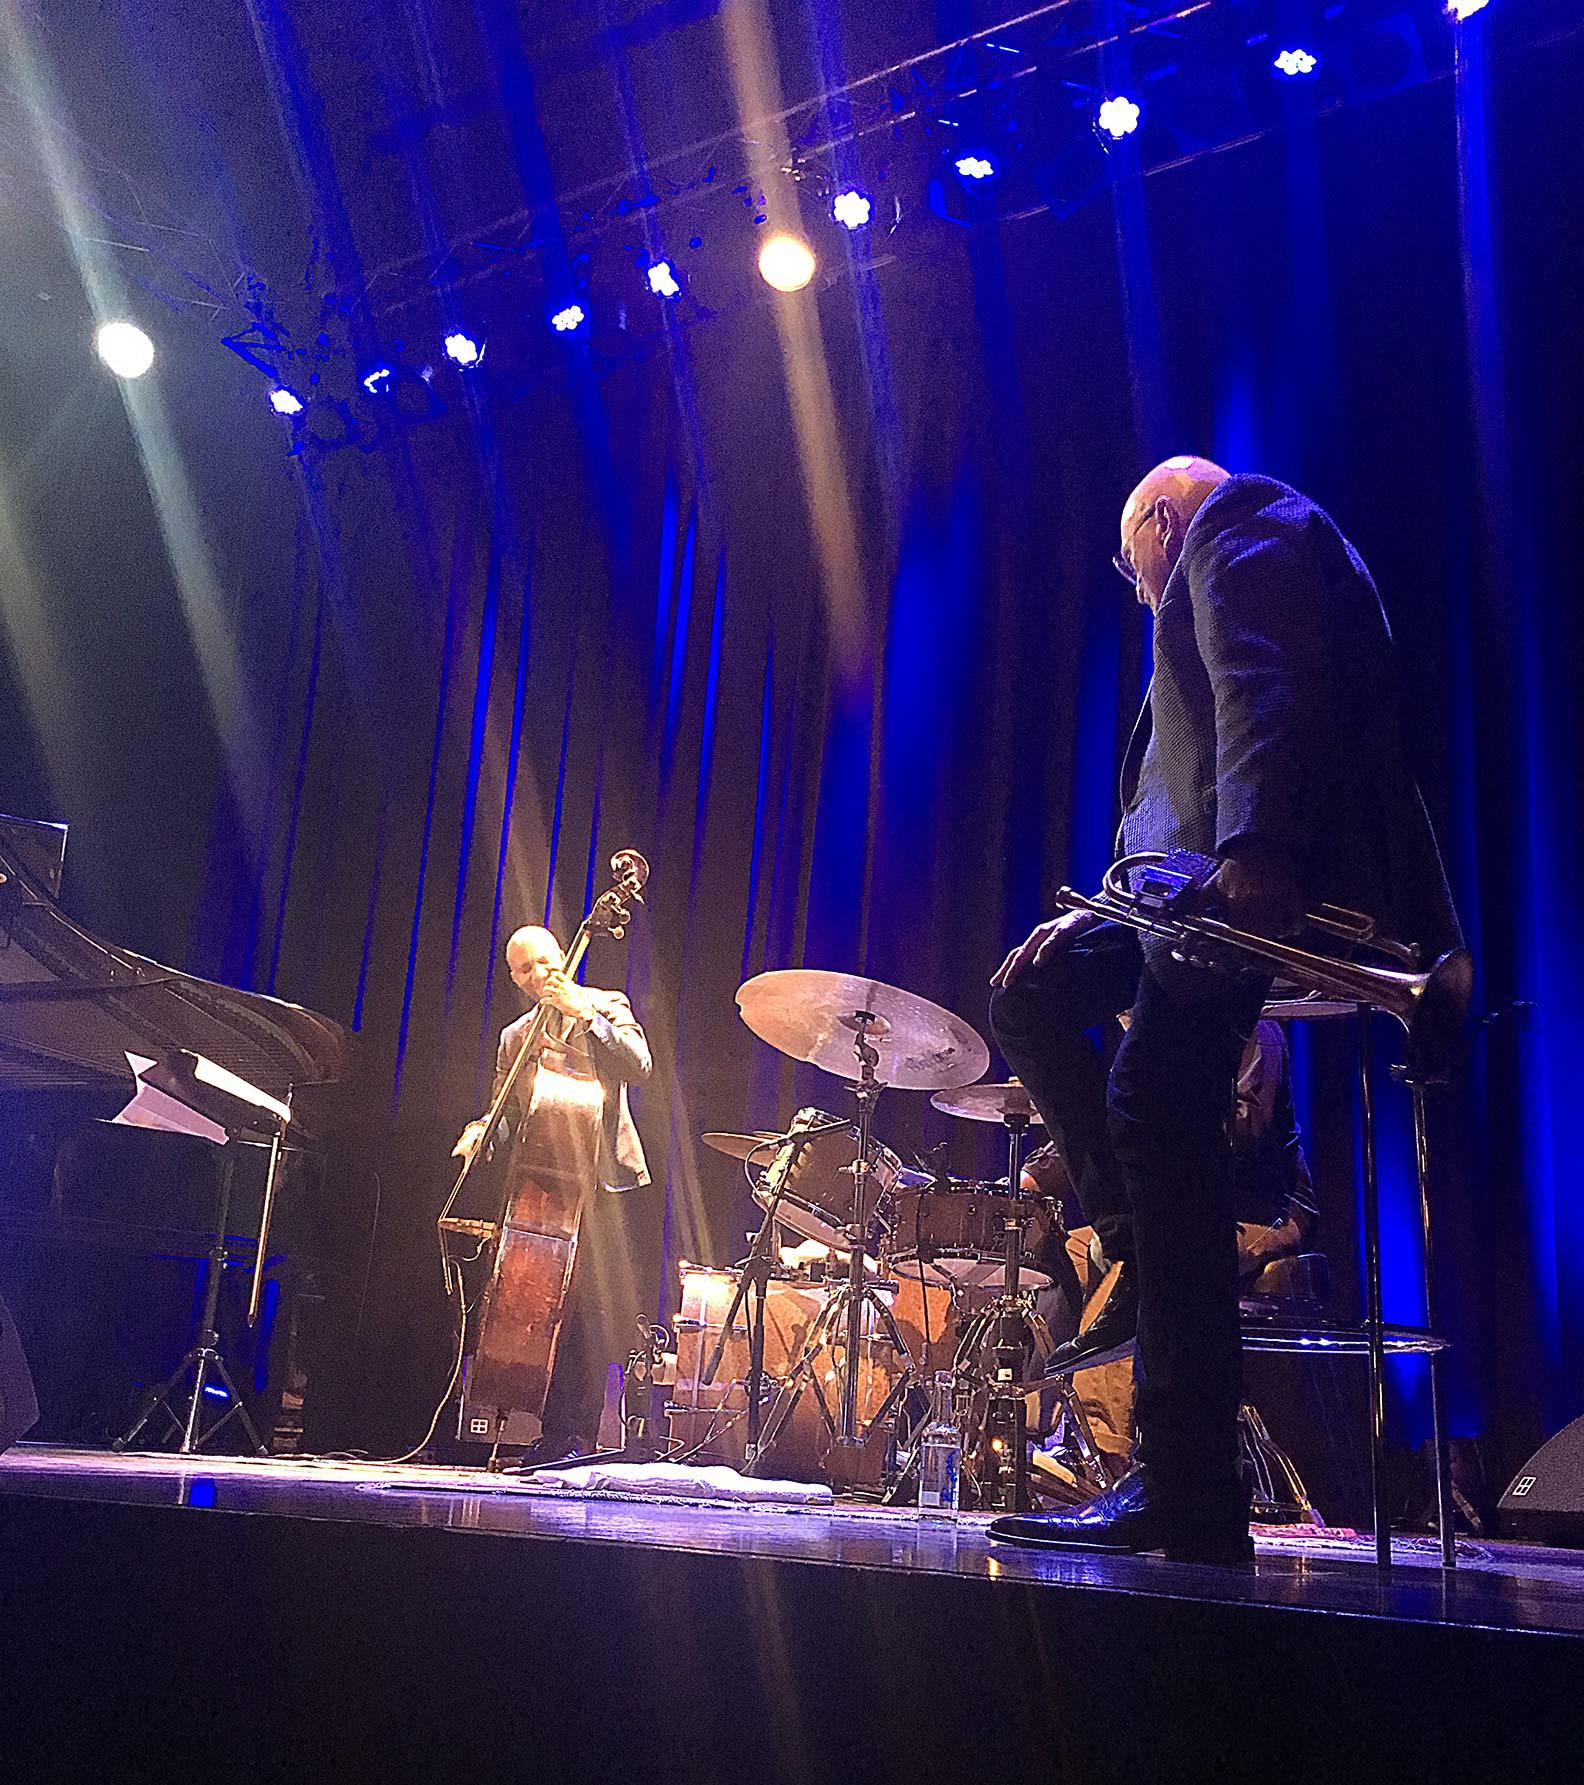 Stanko-Stage-3-Oslo--9.4.2016